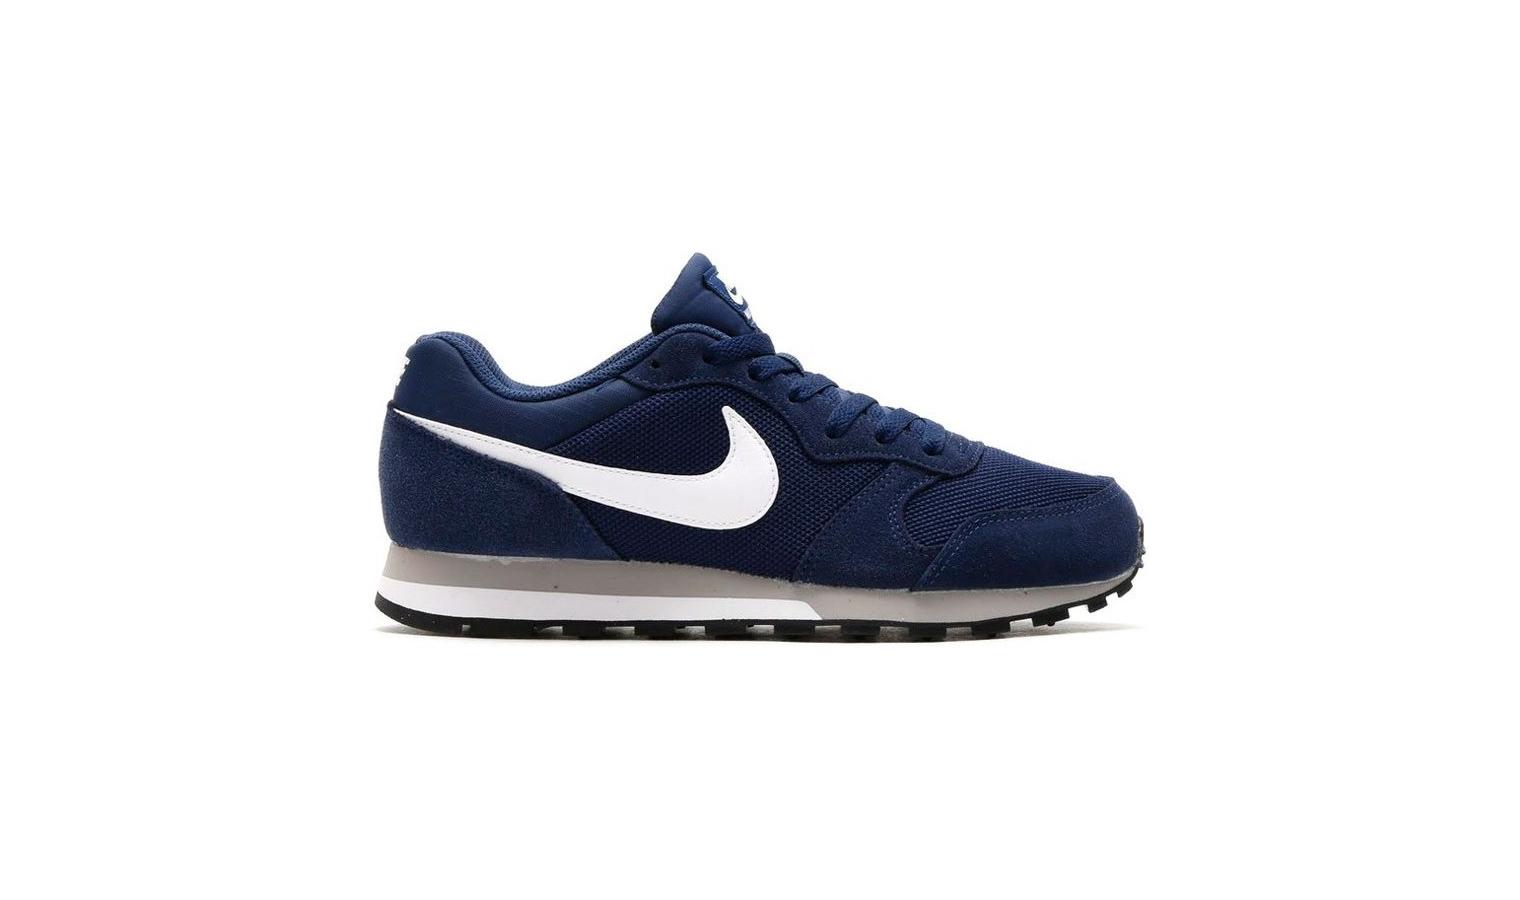 c654e7fa57b8 Pánské boty Nike MD RUNNER 2 modré